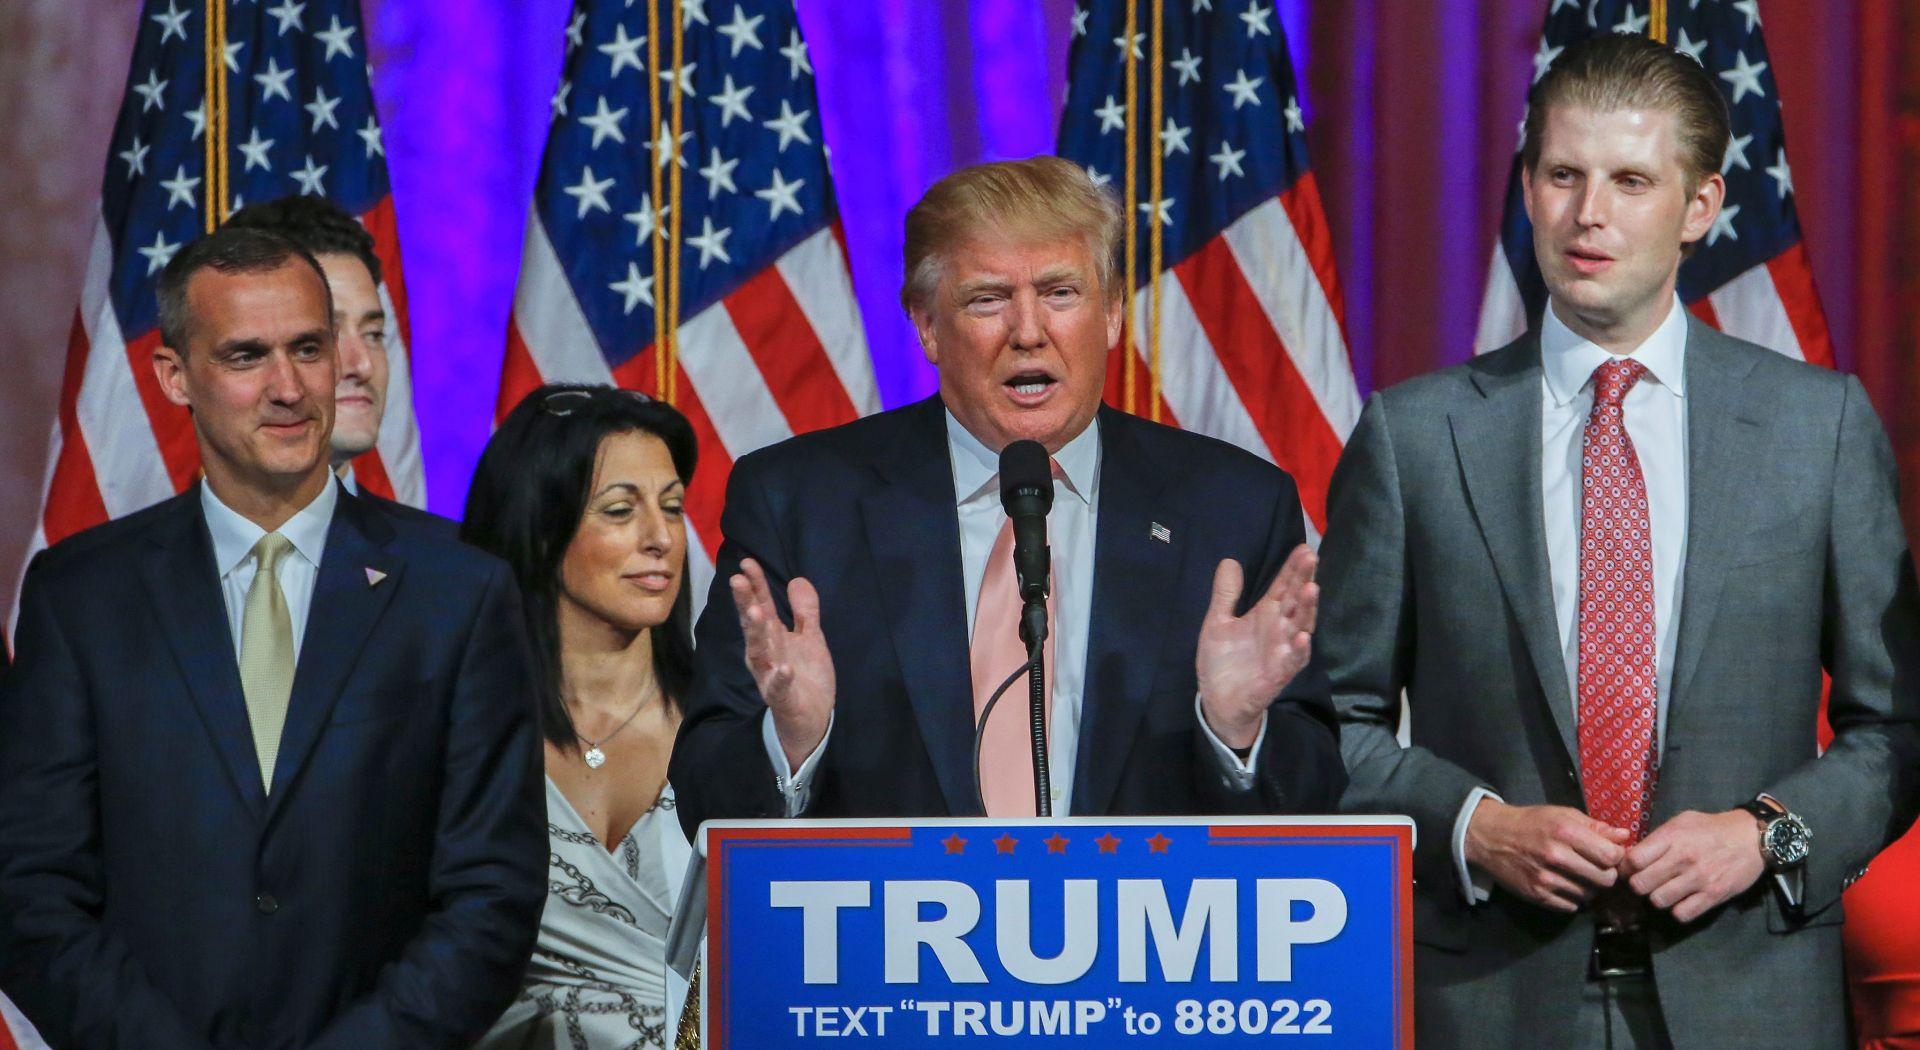 TRUMP Kasich bi trebao odustati, ionako ne može skupiti dovoljno delegata